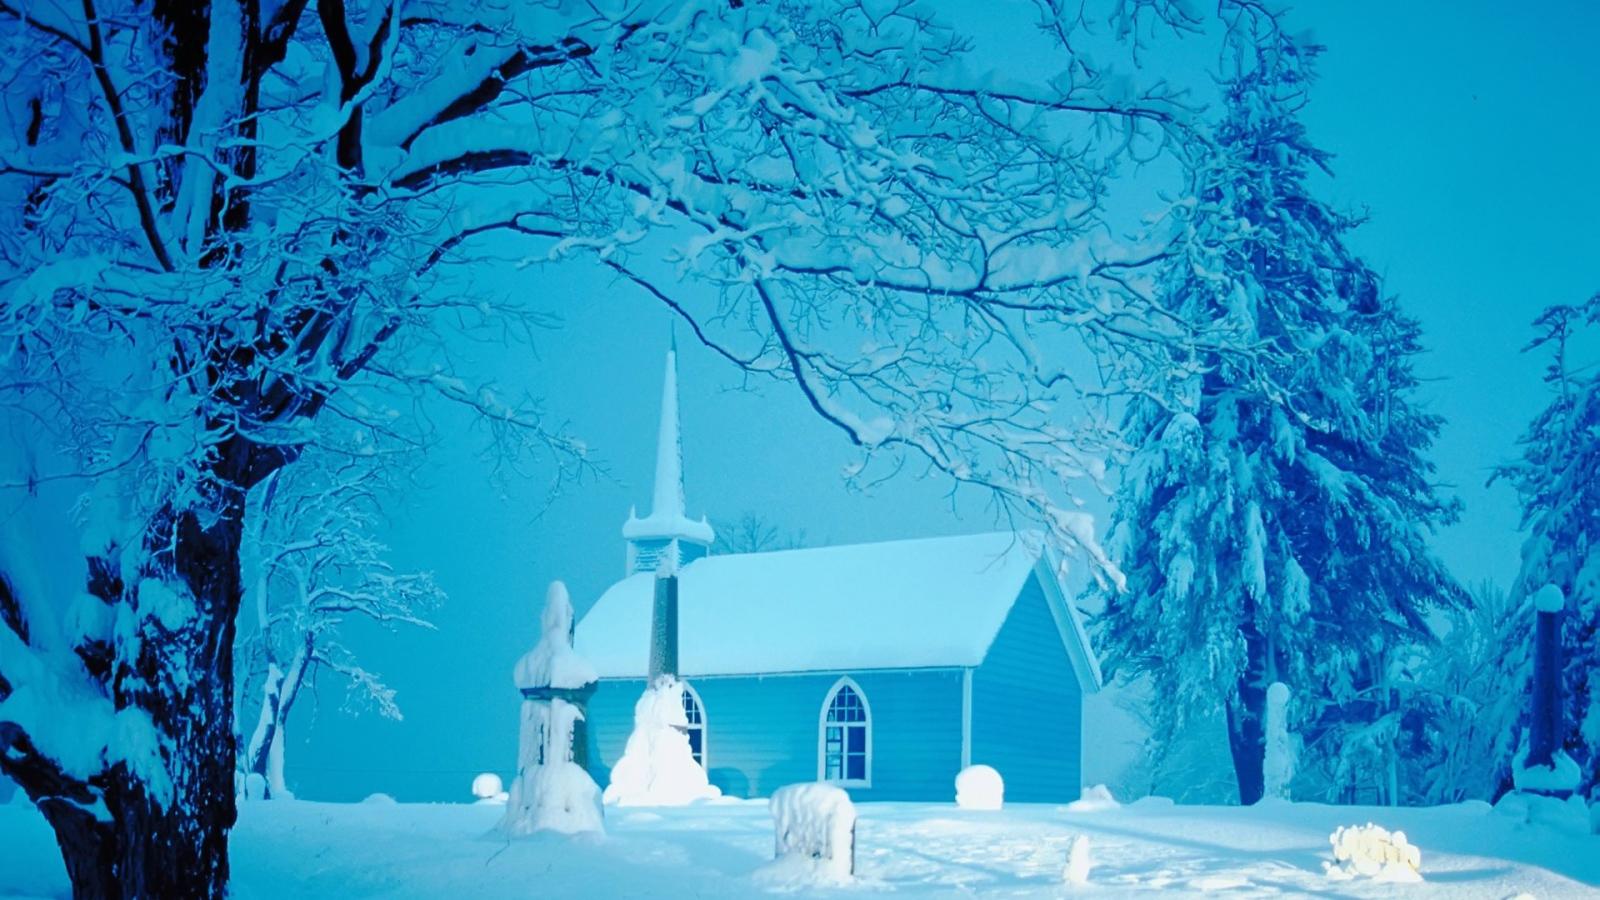 1600x900 hd desktop wallpaper winter - photo #11